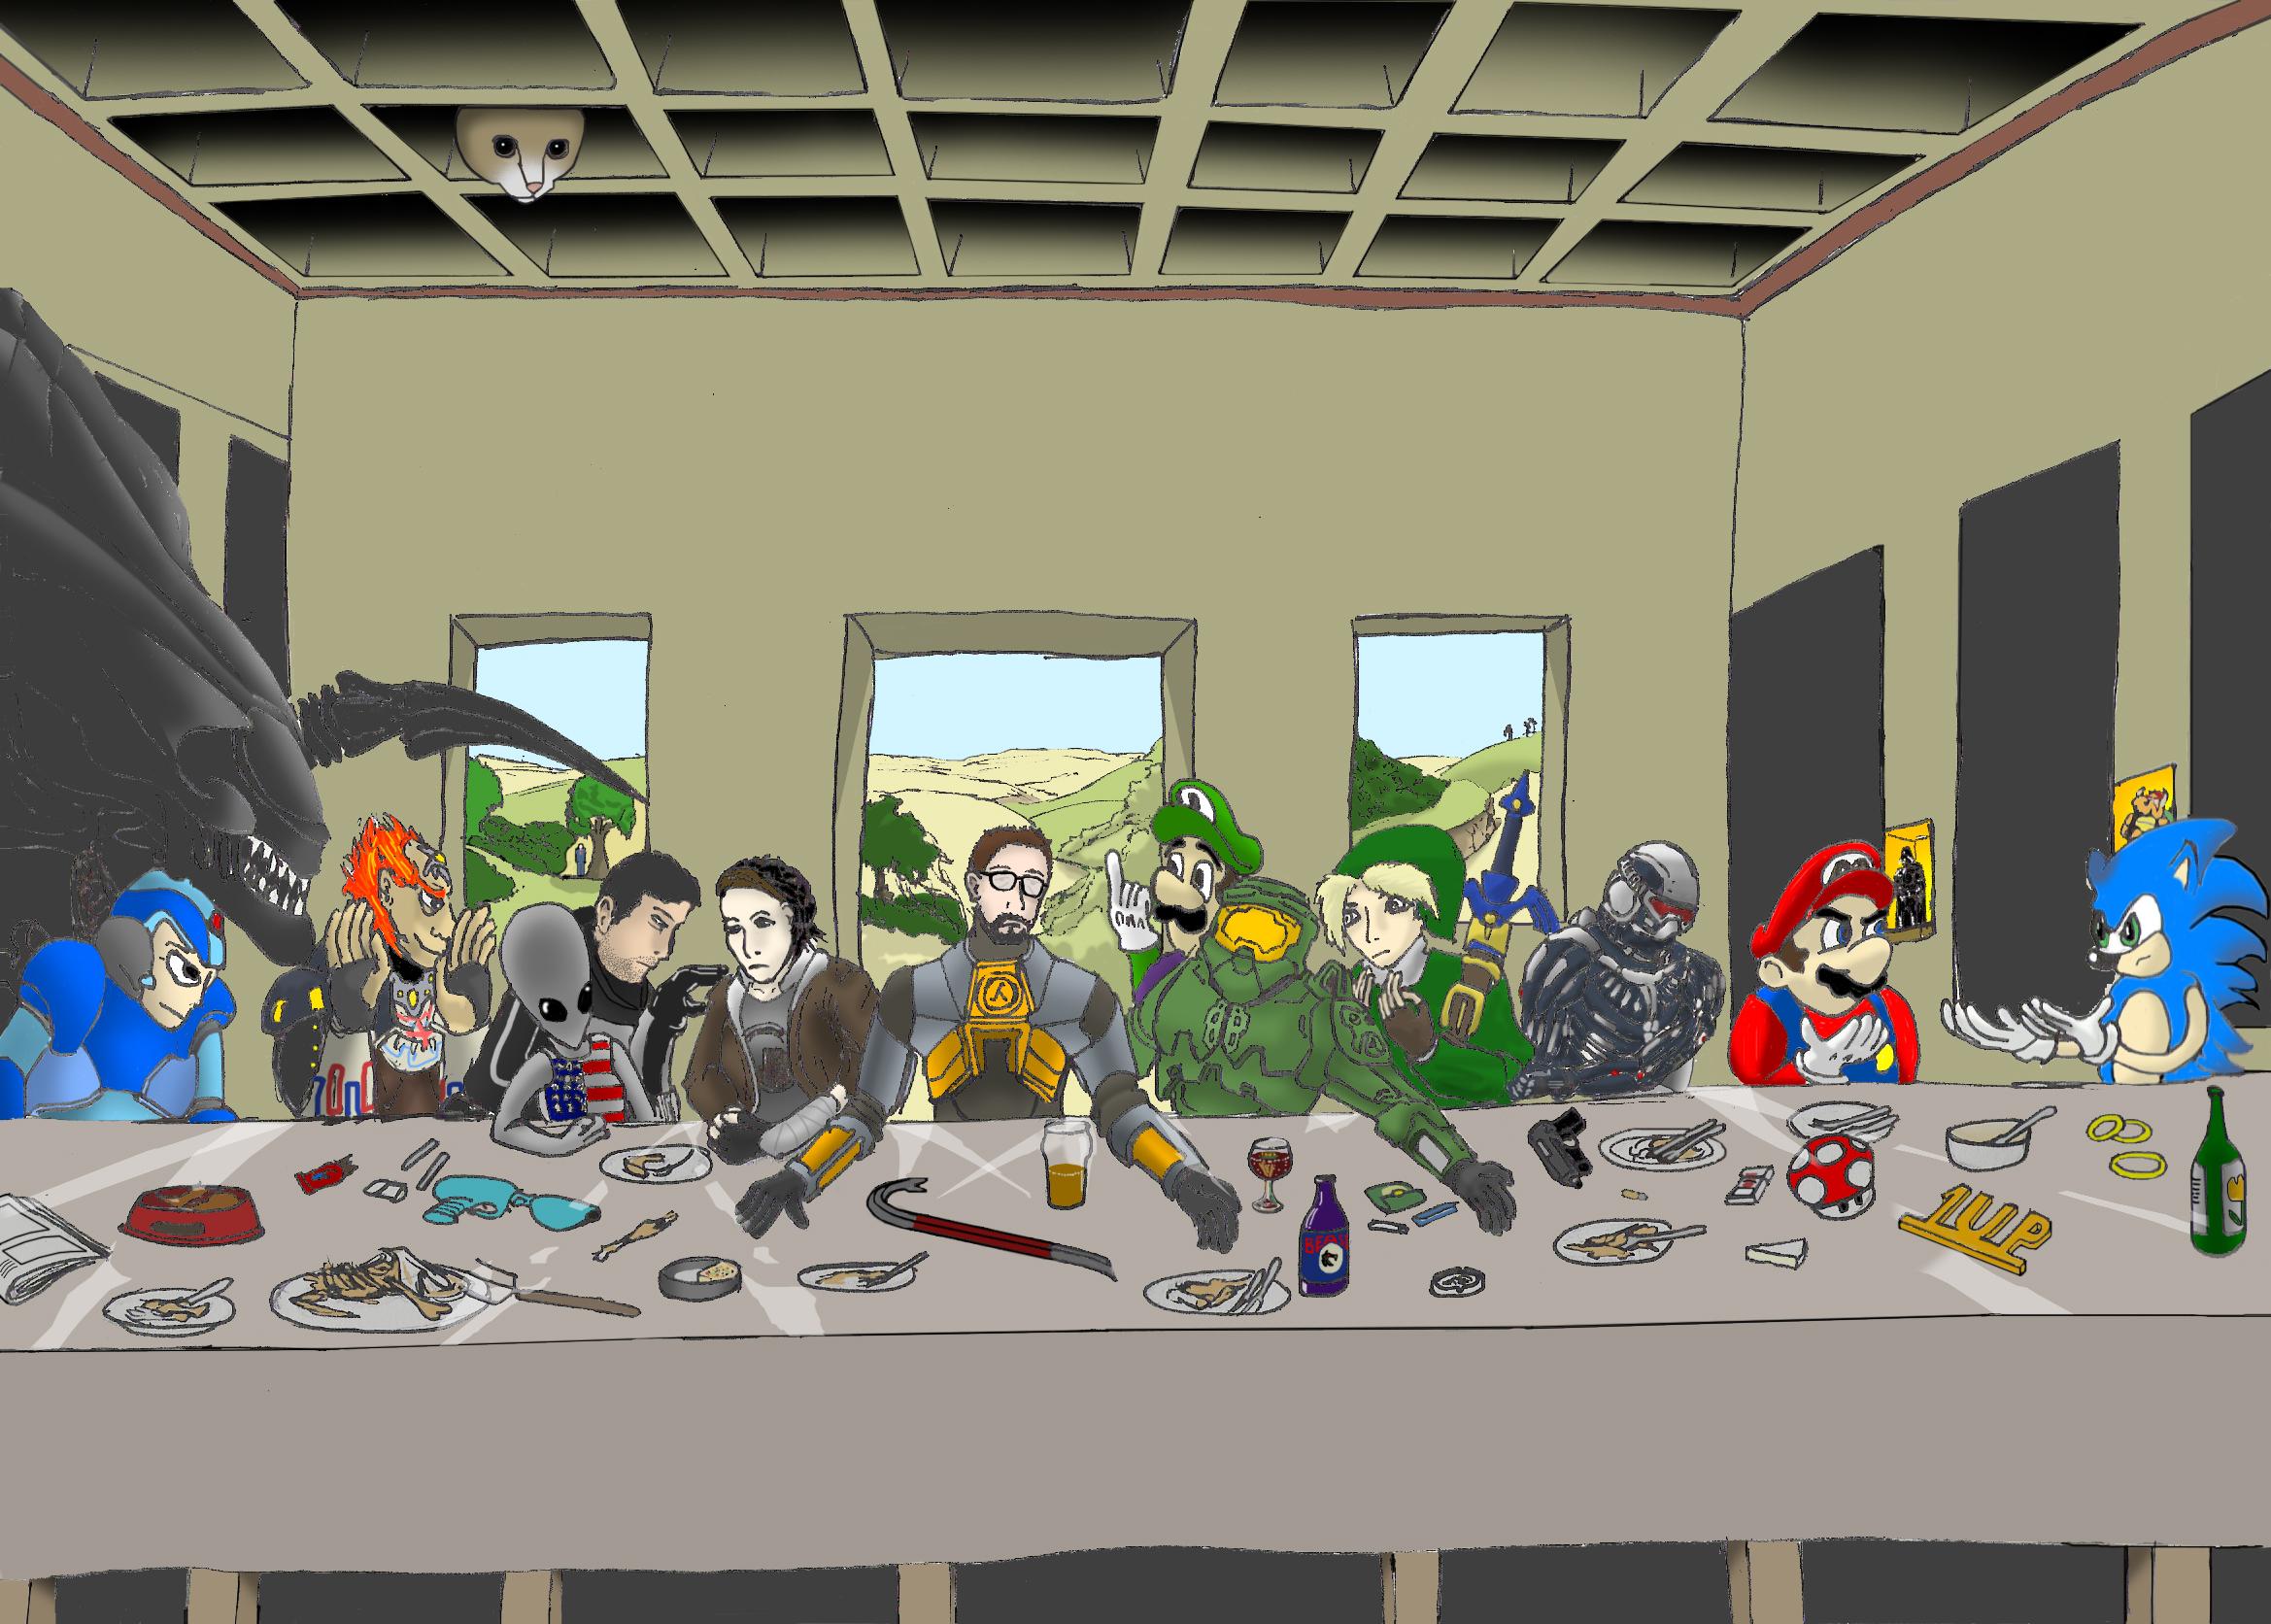 The Freeman's last supper